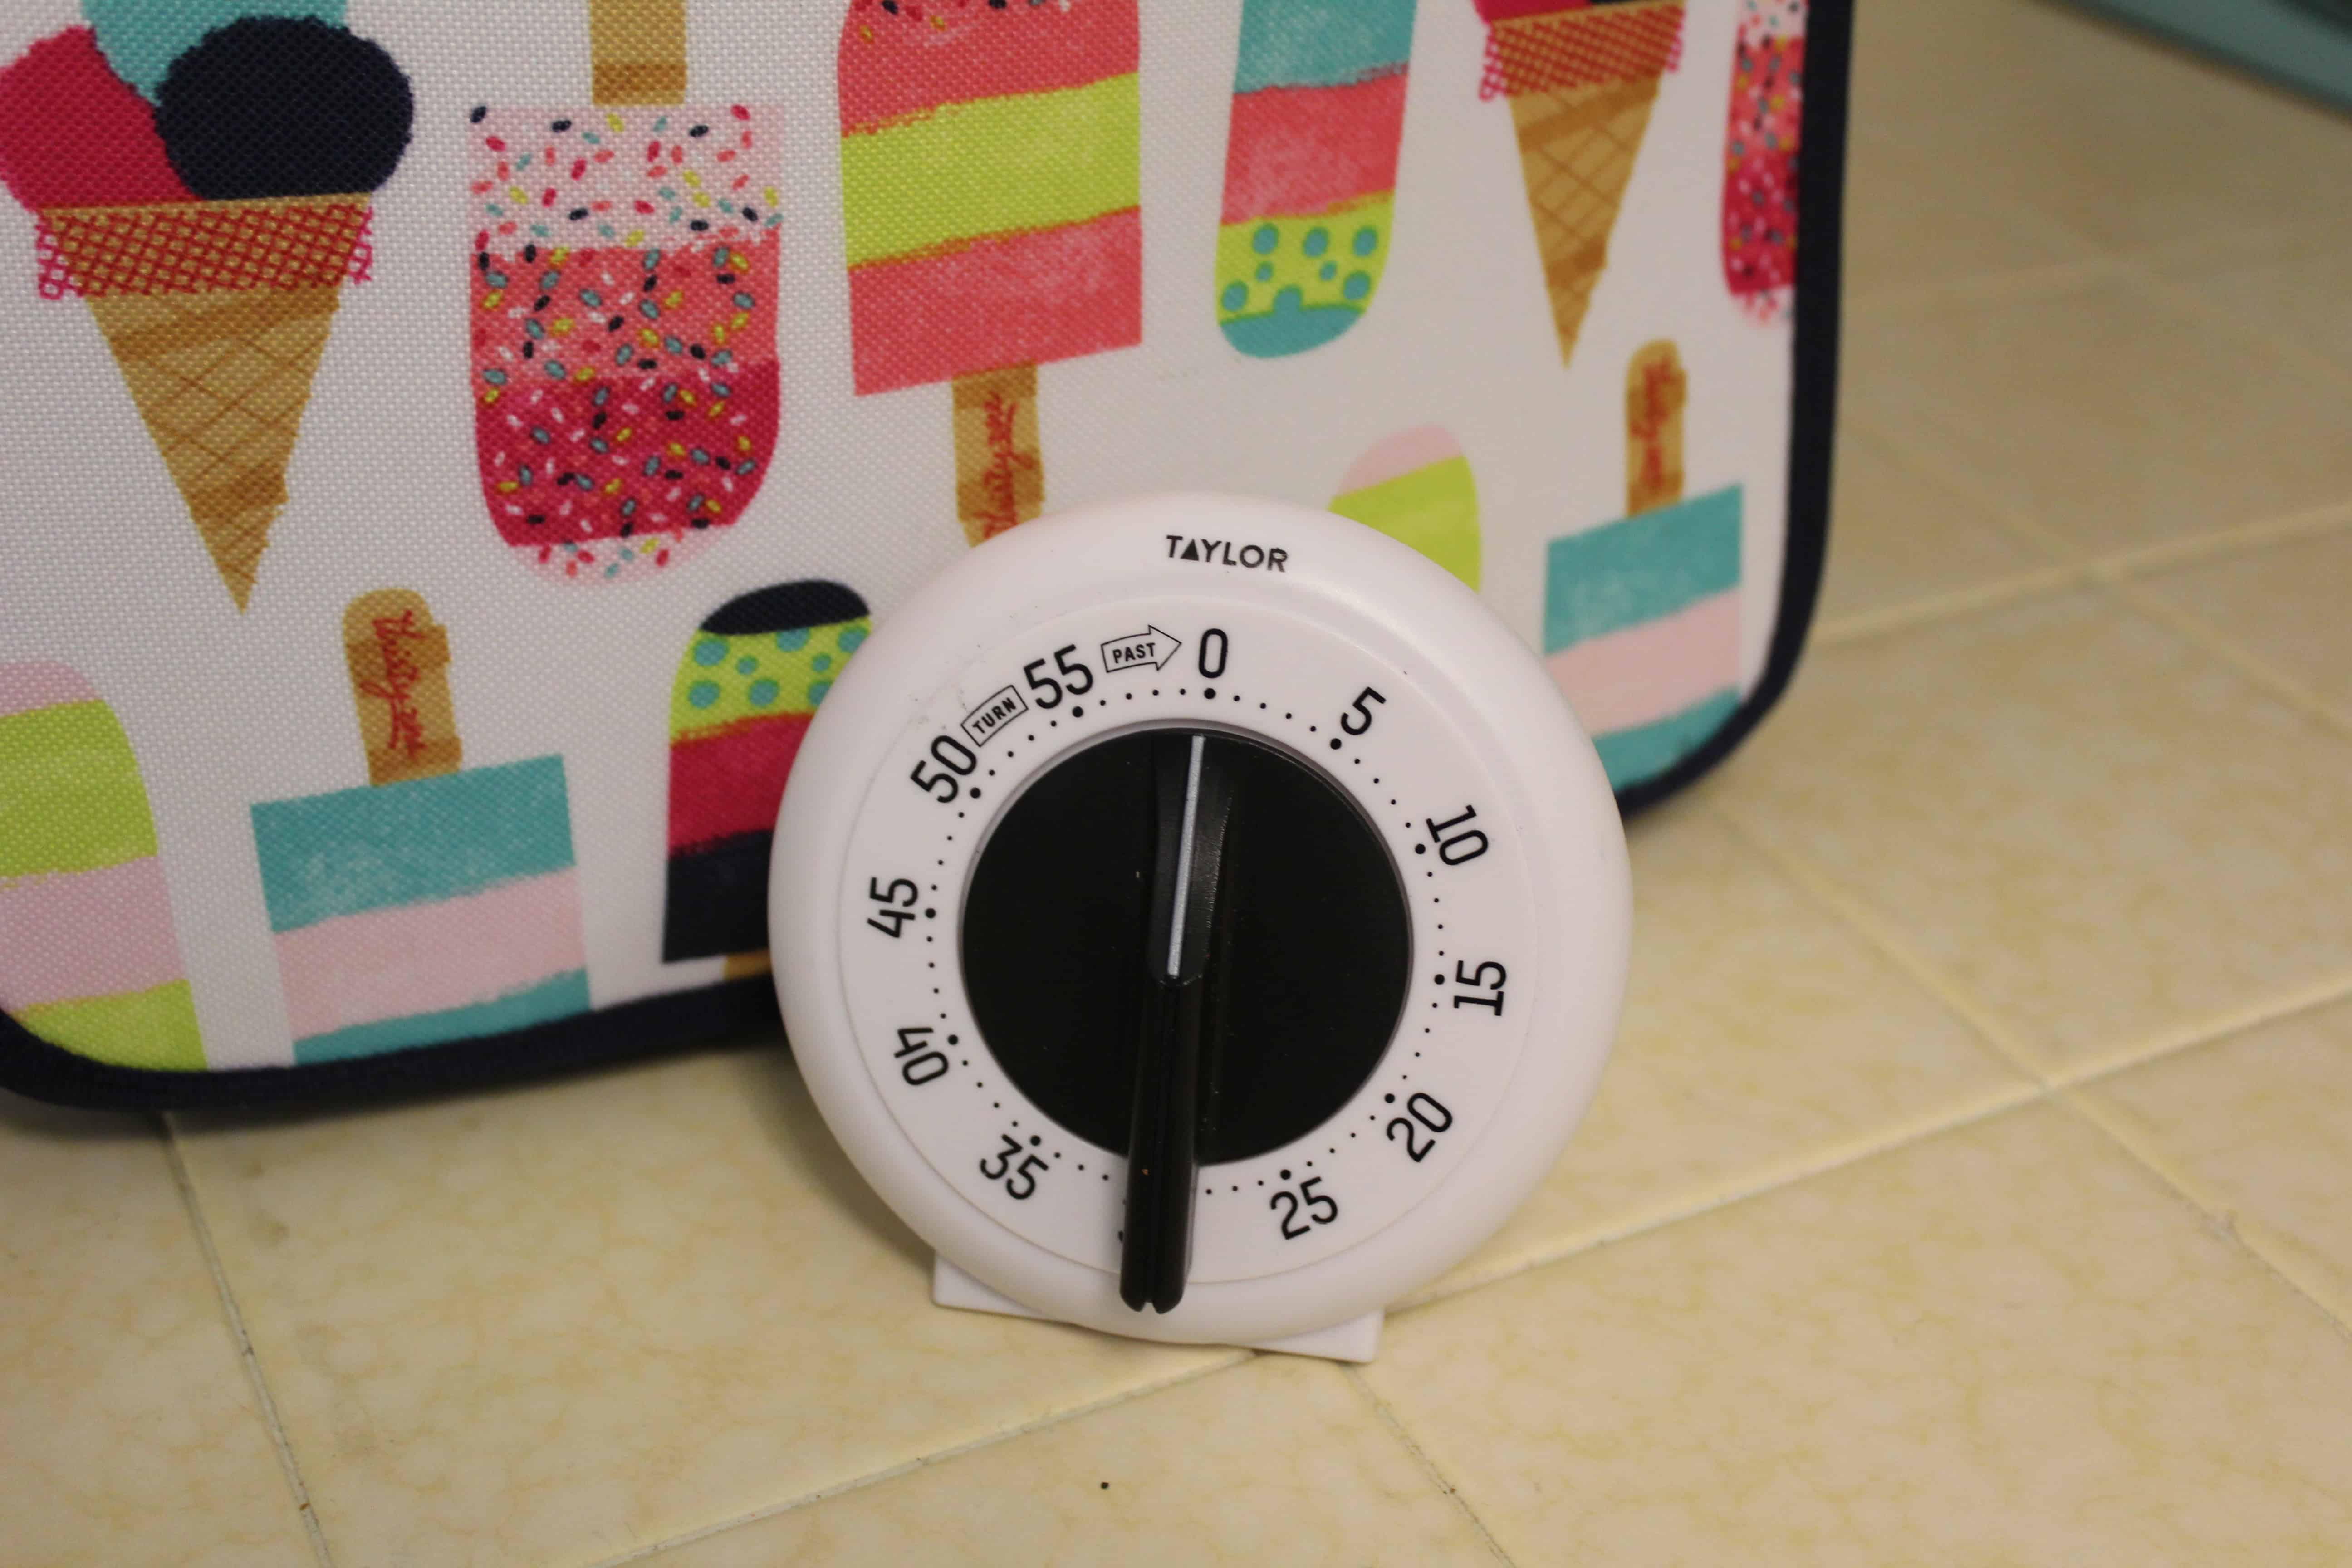 a kitchen timer for timing homework breaks